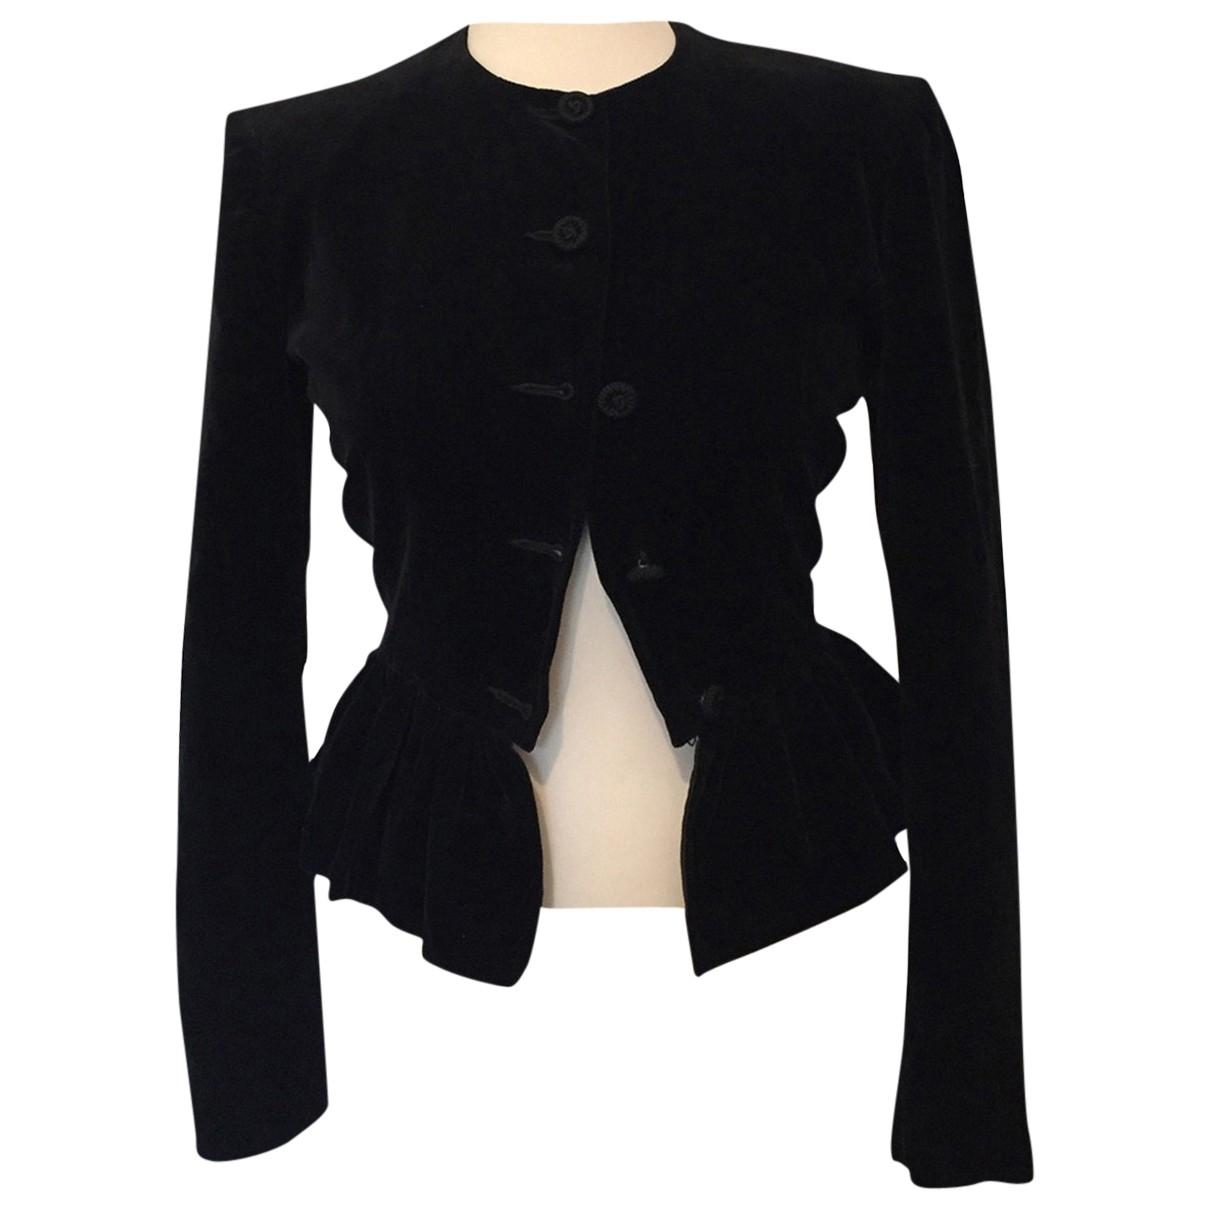 Max Mara \N Black Cotton jacket for Women S International